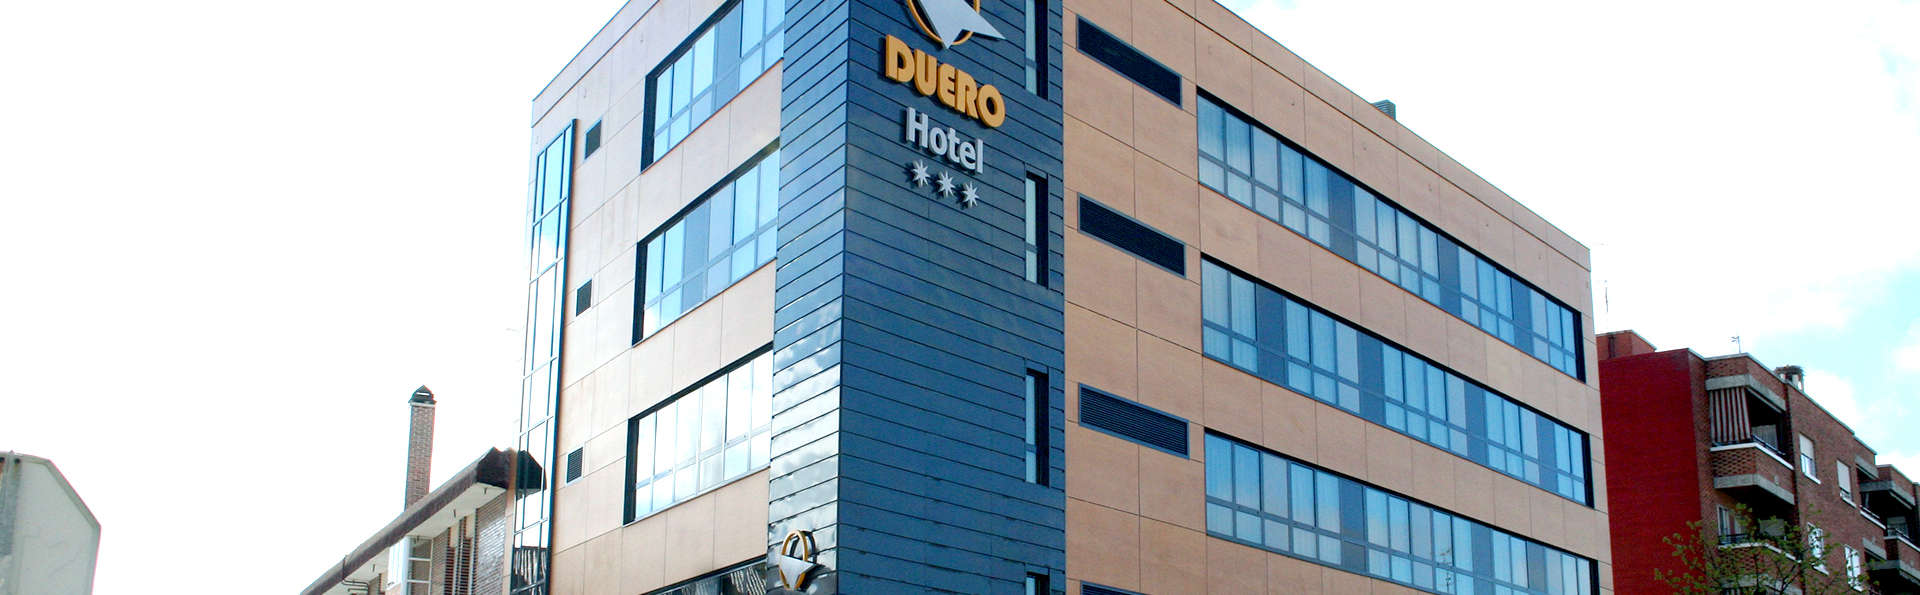 Duero Hotel  - Edit_Front.jpg